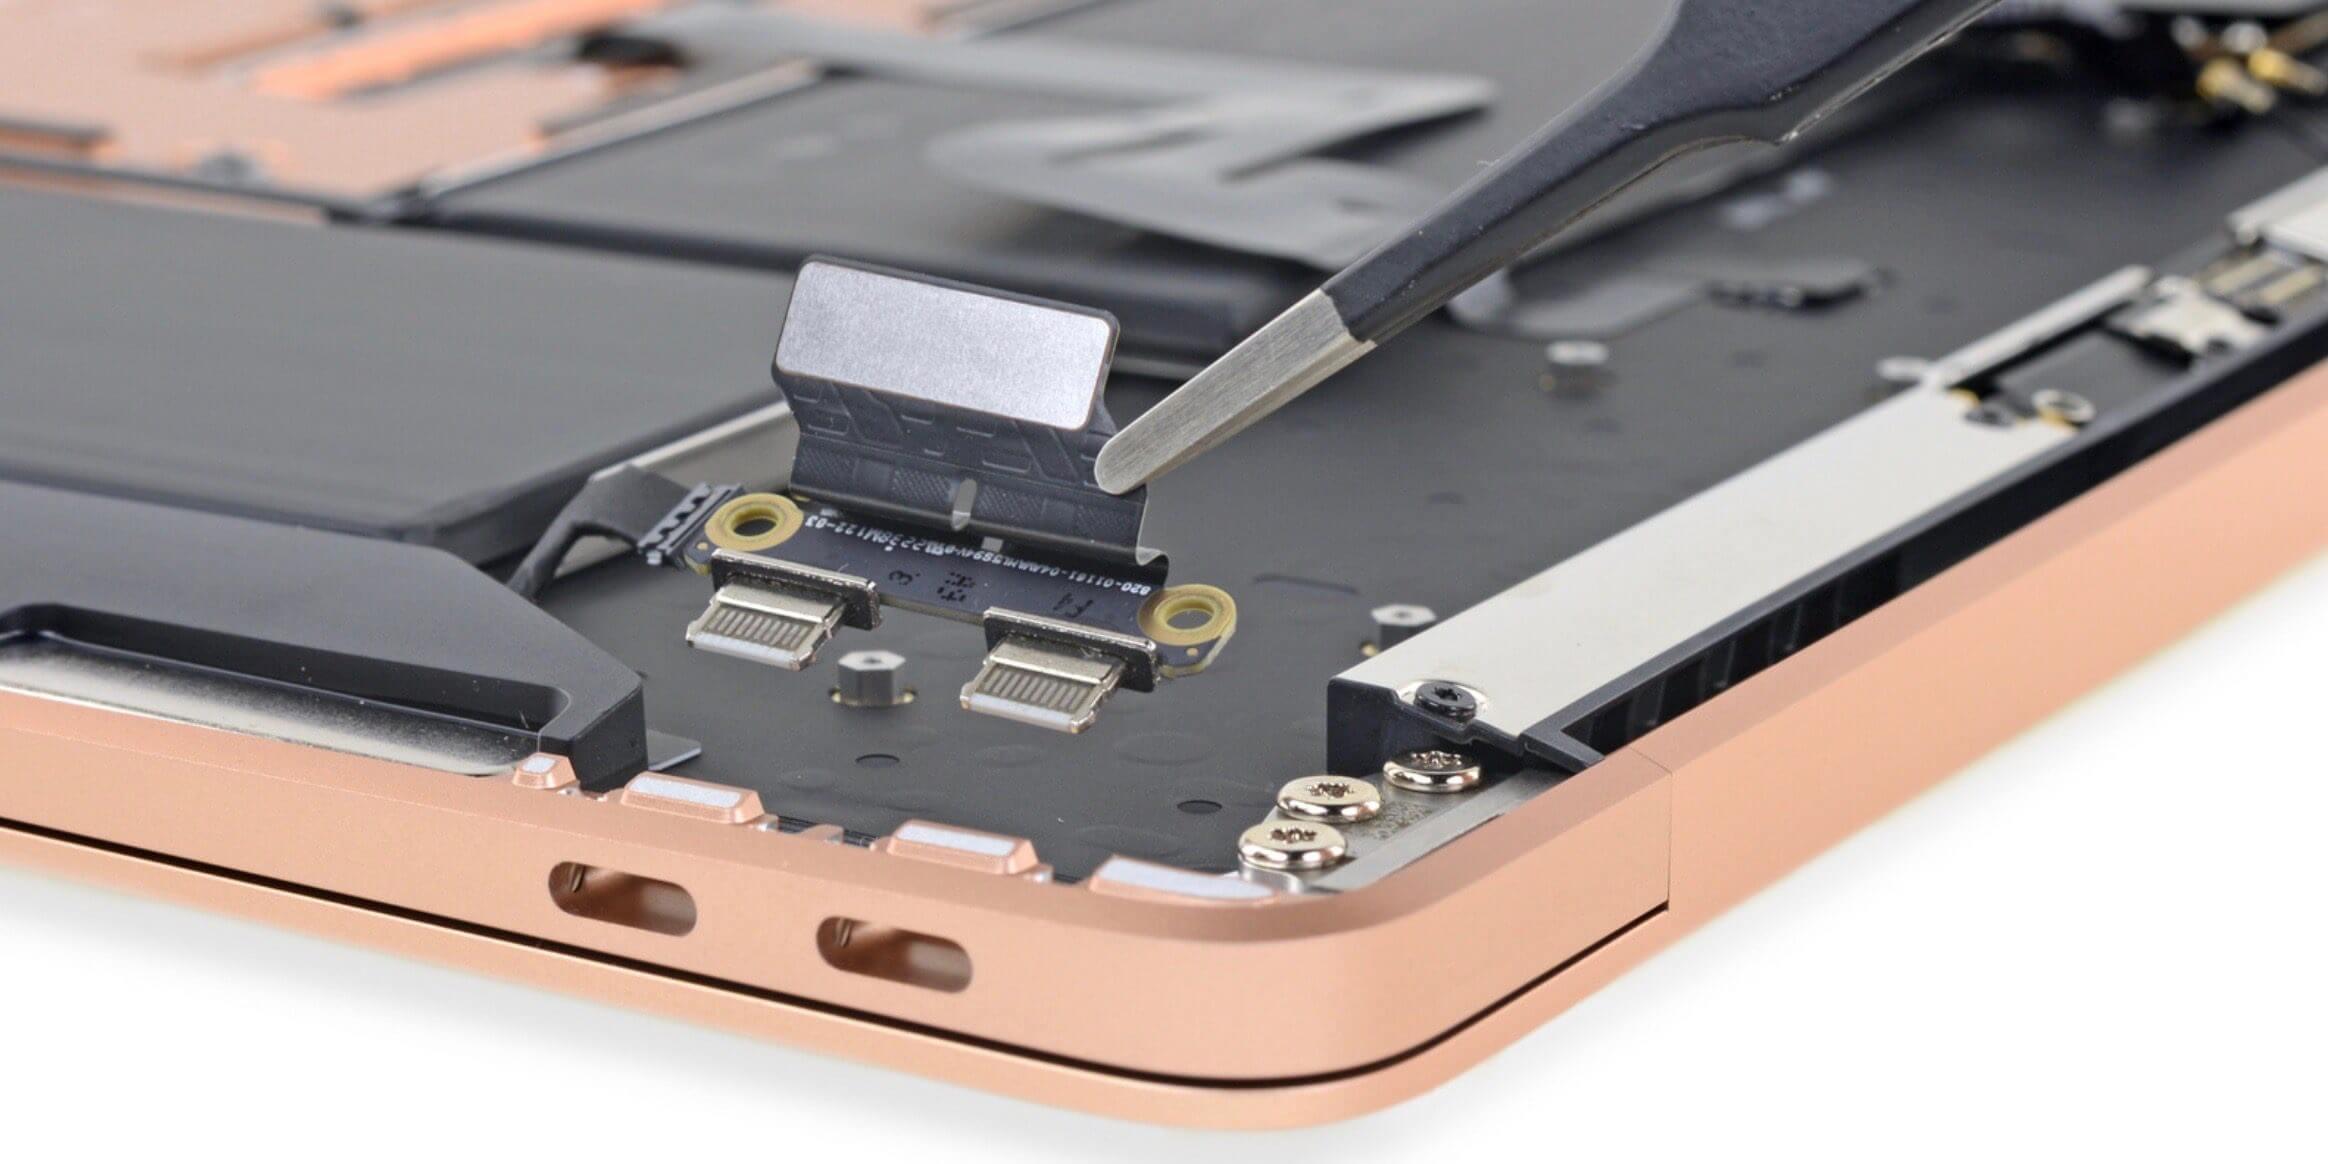 macbook air 2018 интересного внутри